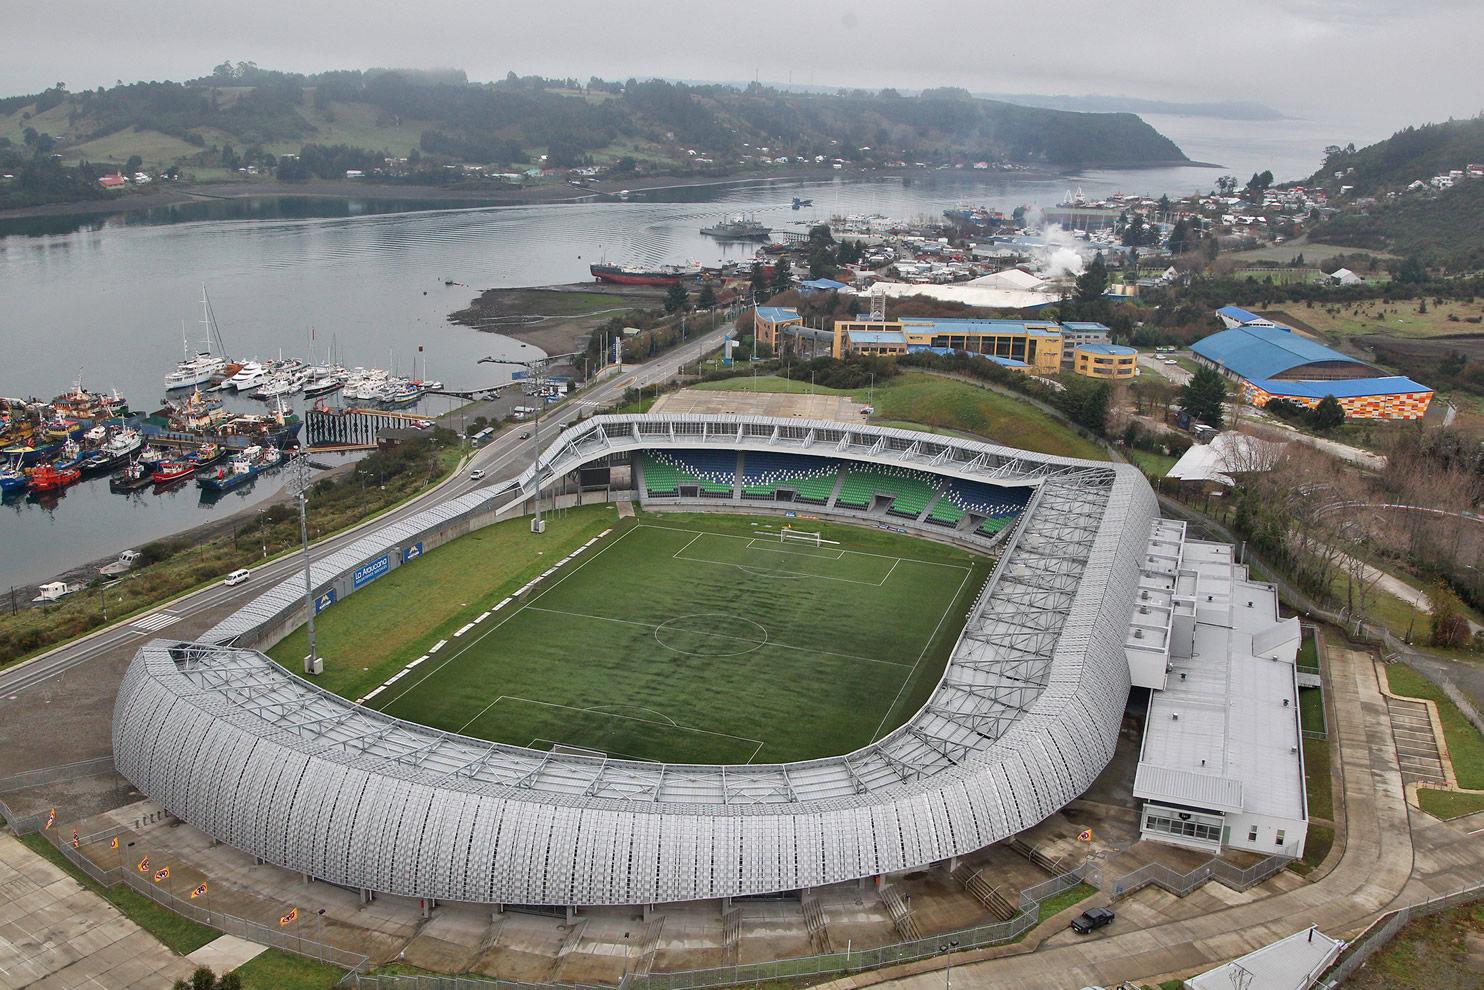 Estadio Chinquihue de Cristián Fernández compite por mejor recinto deportivo 2013, Courtesy of Instituto Nacional de Deportes